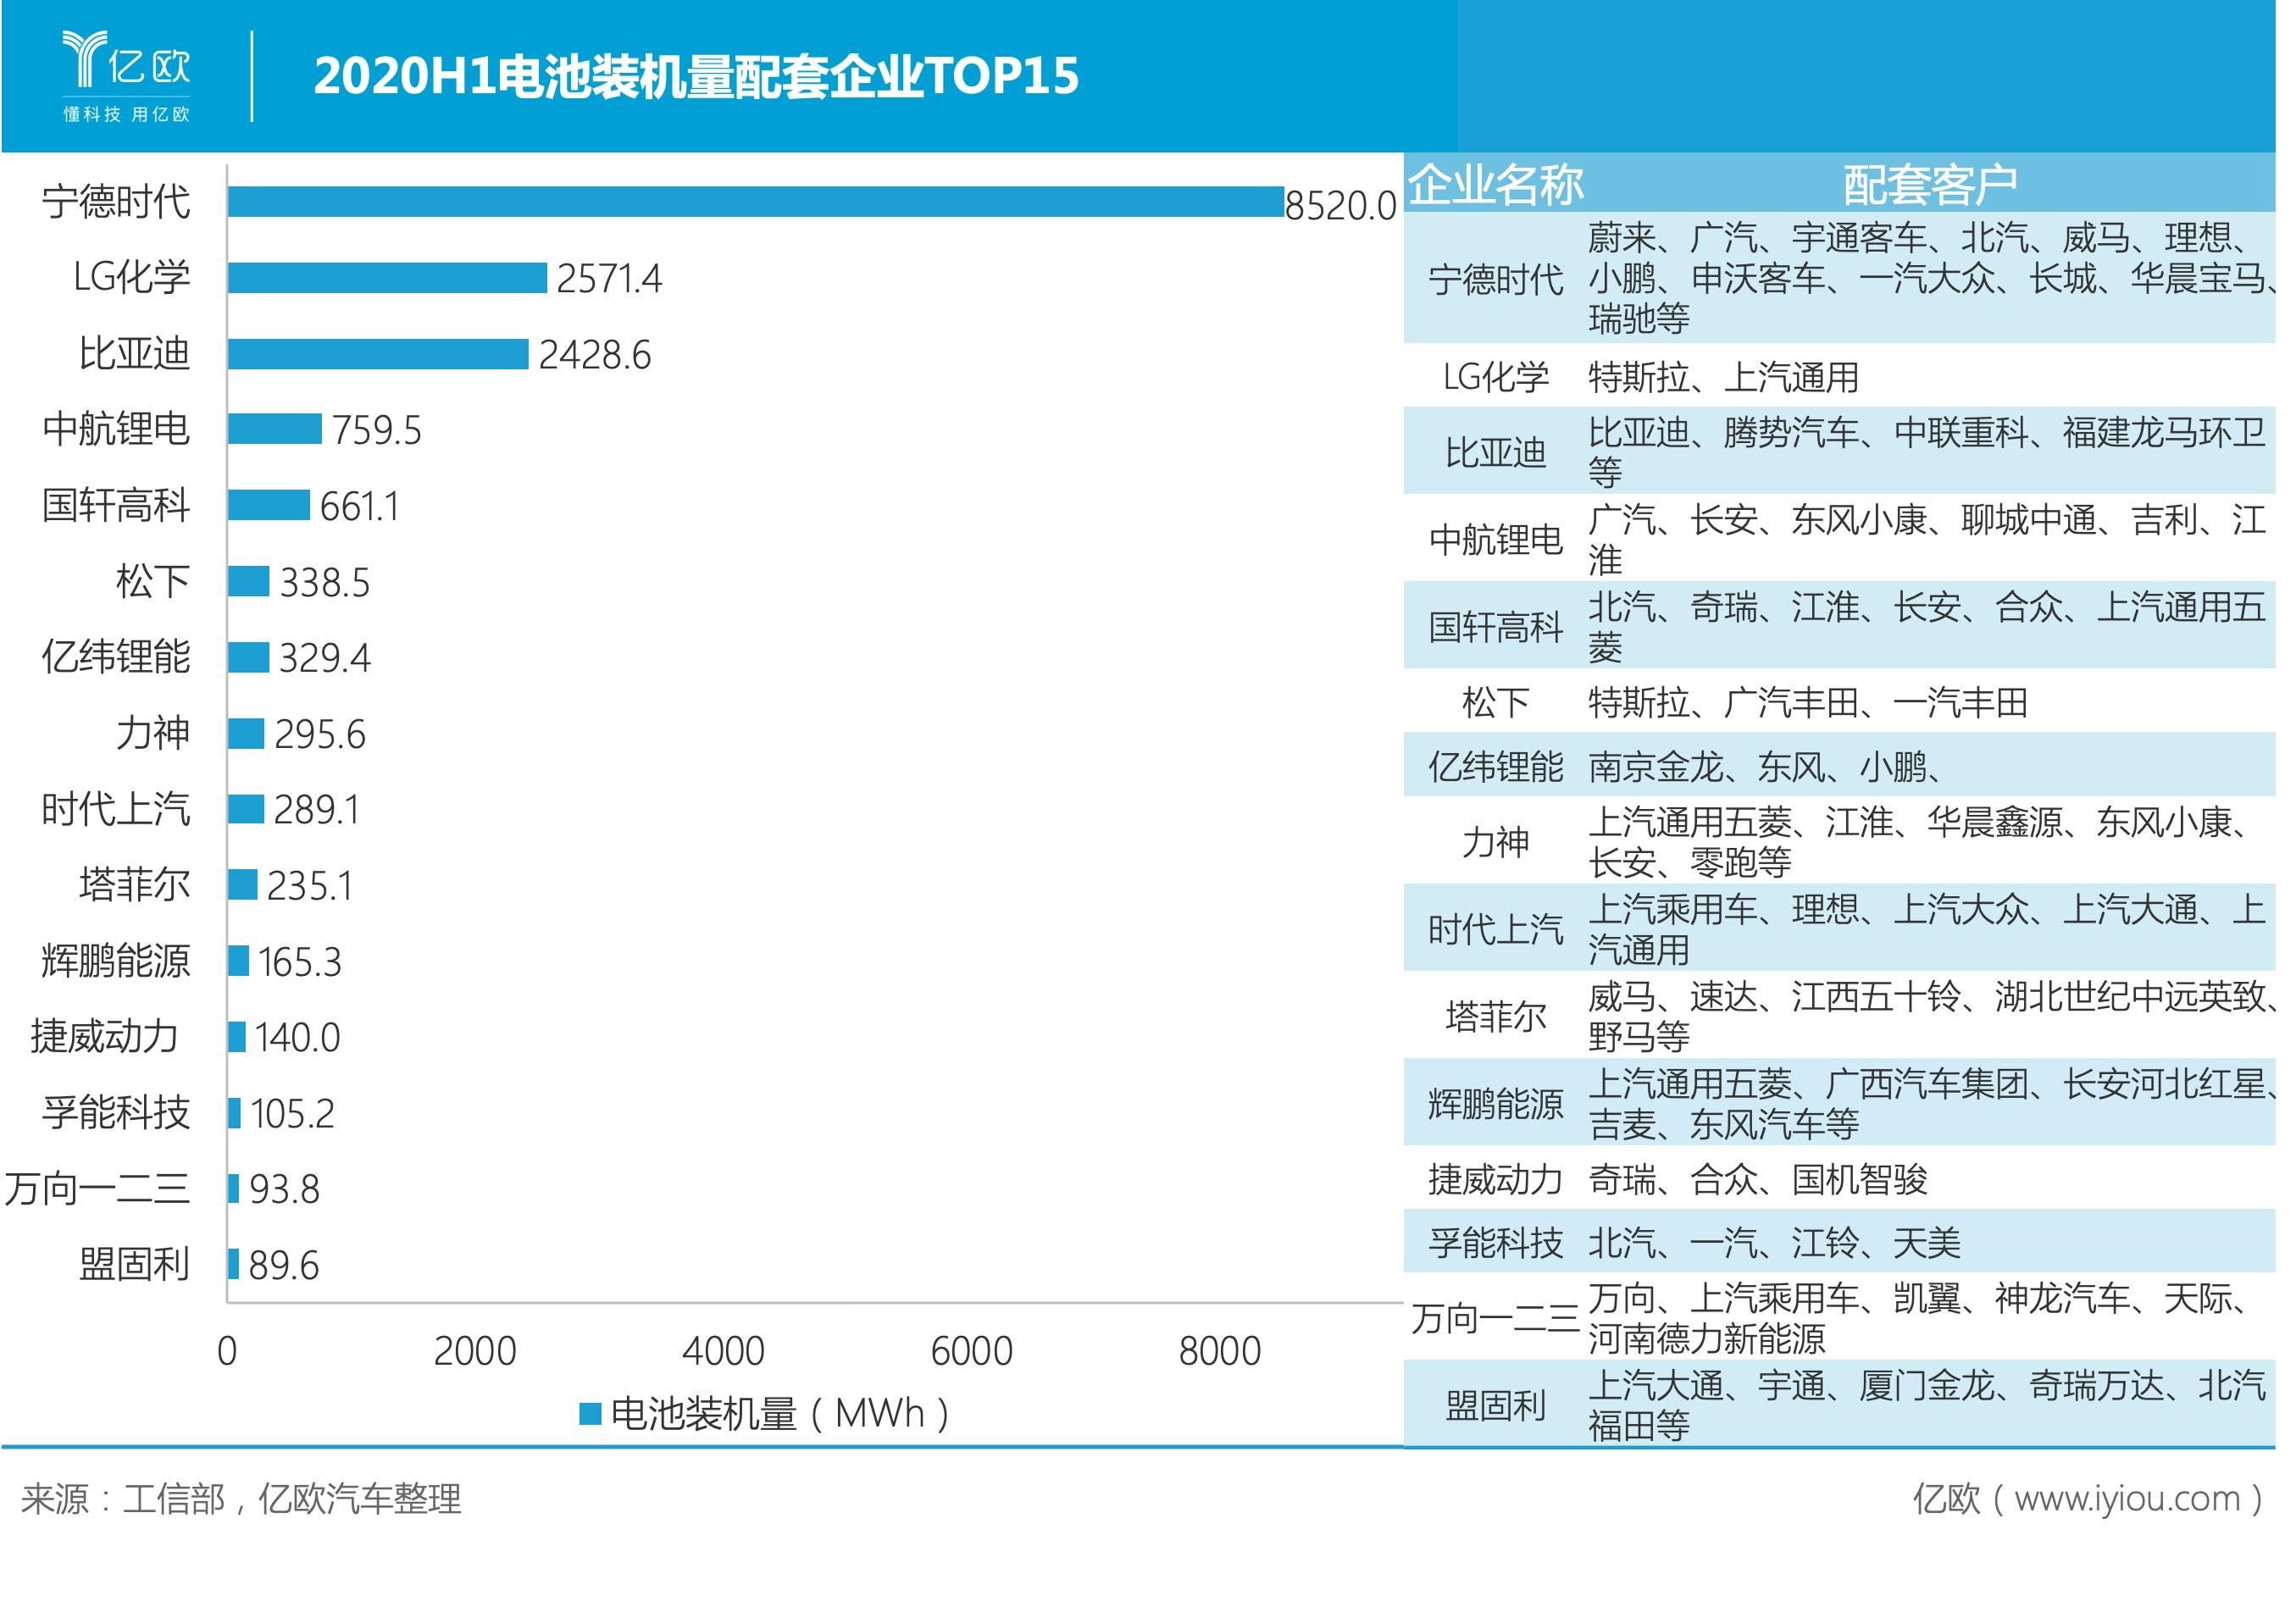 2020H1电池装机量配套企业TOP15